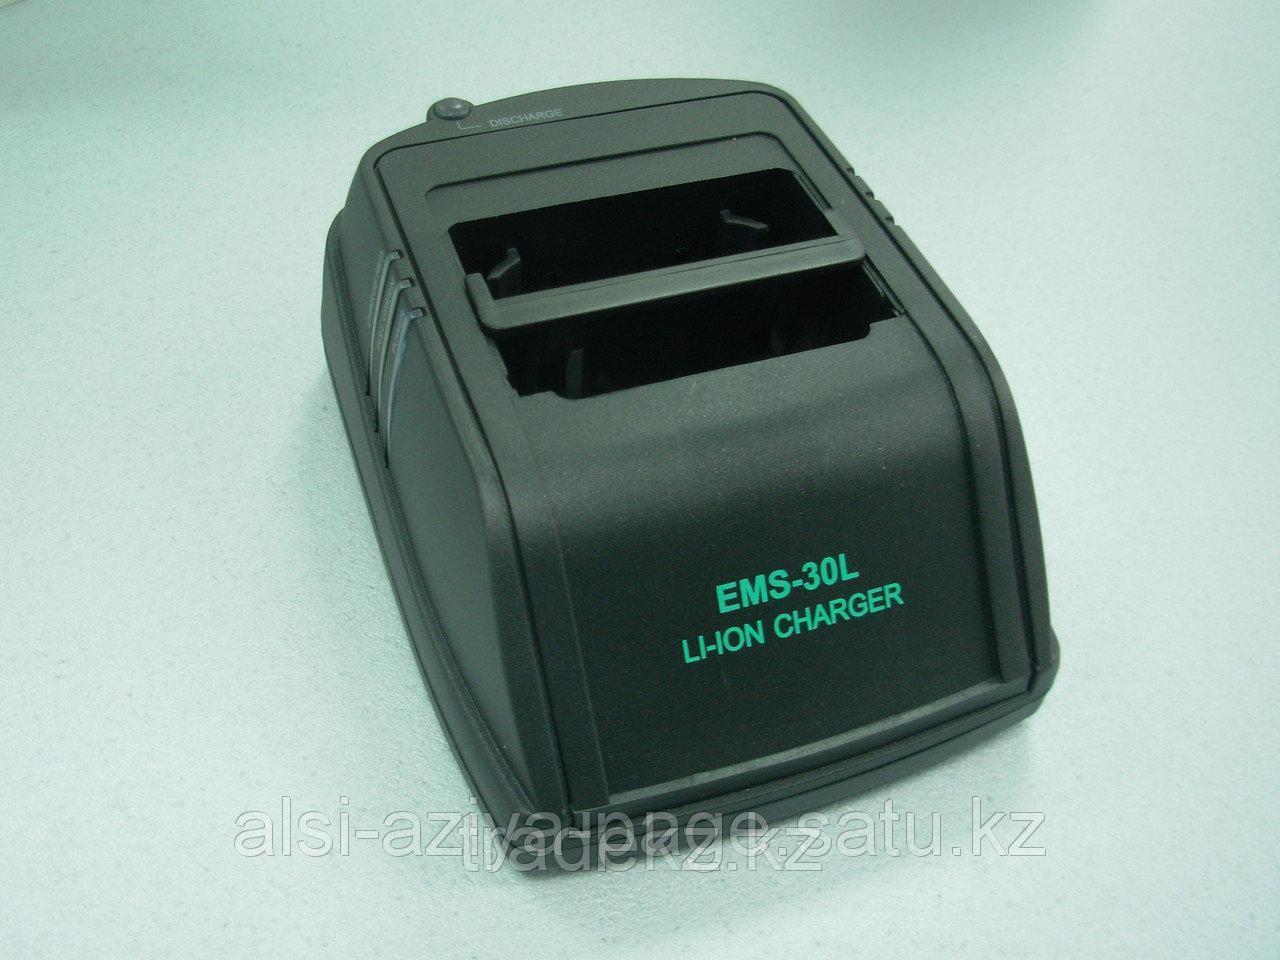 Зарядное устройство EMS-30CL для р/ст BP-211Li ускоренное